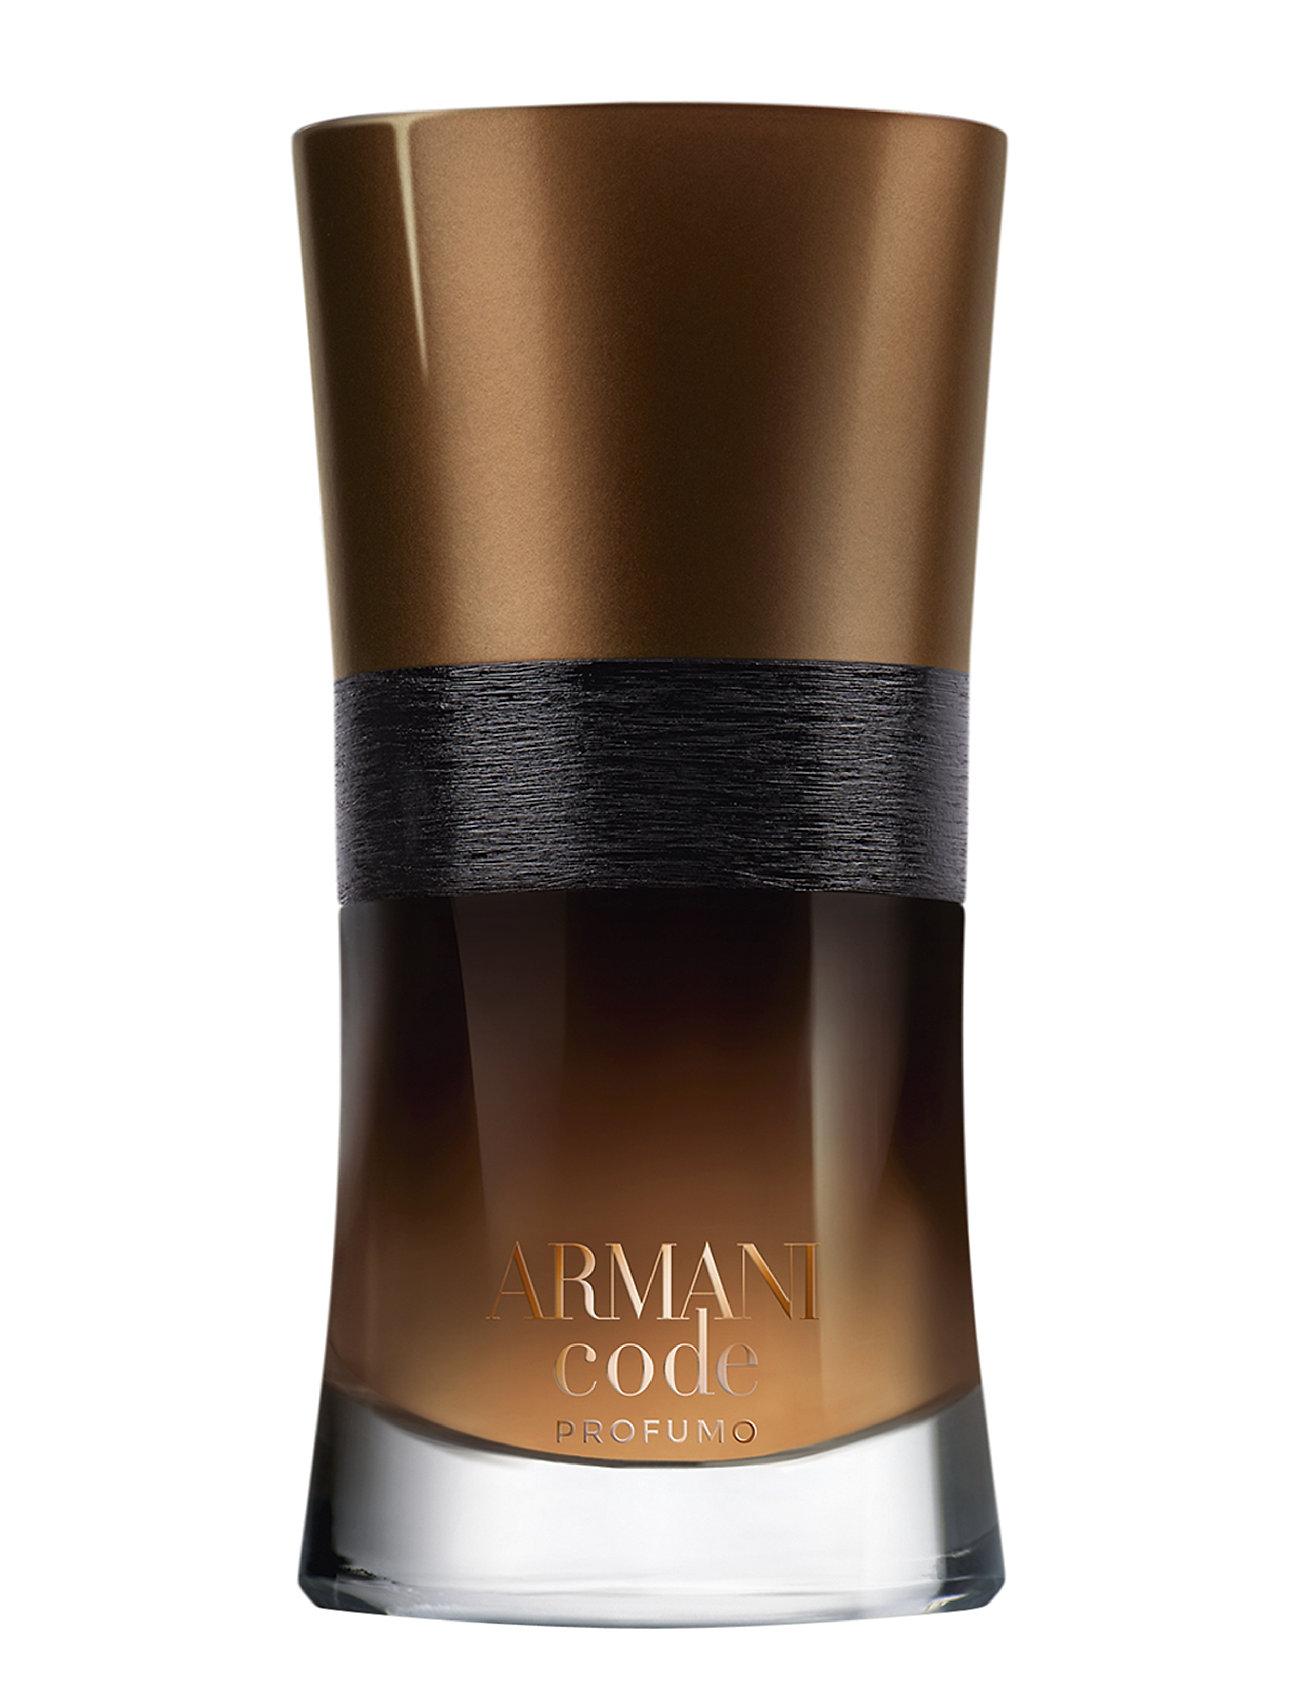 giorgio armani Armani code profumo eau de parfum 30 ml på boozt.com dk